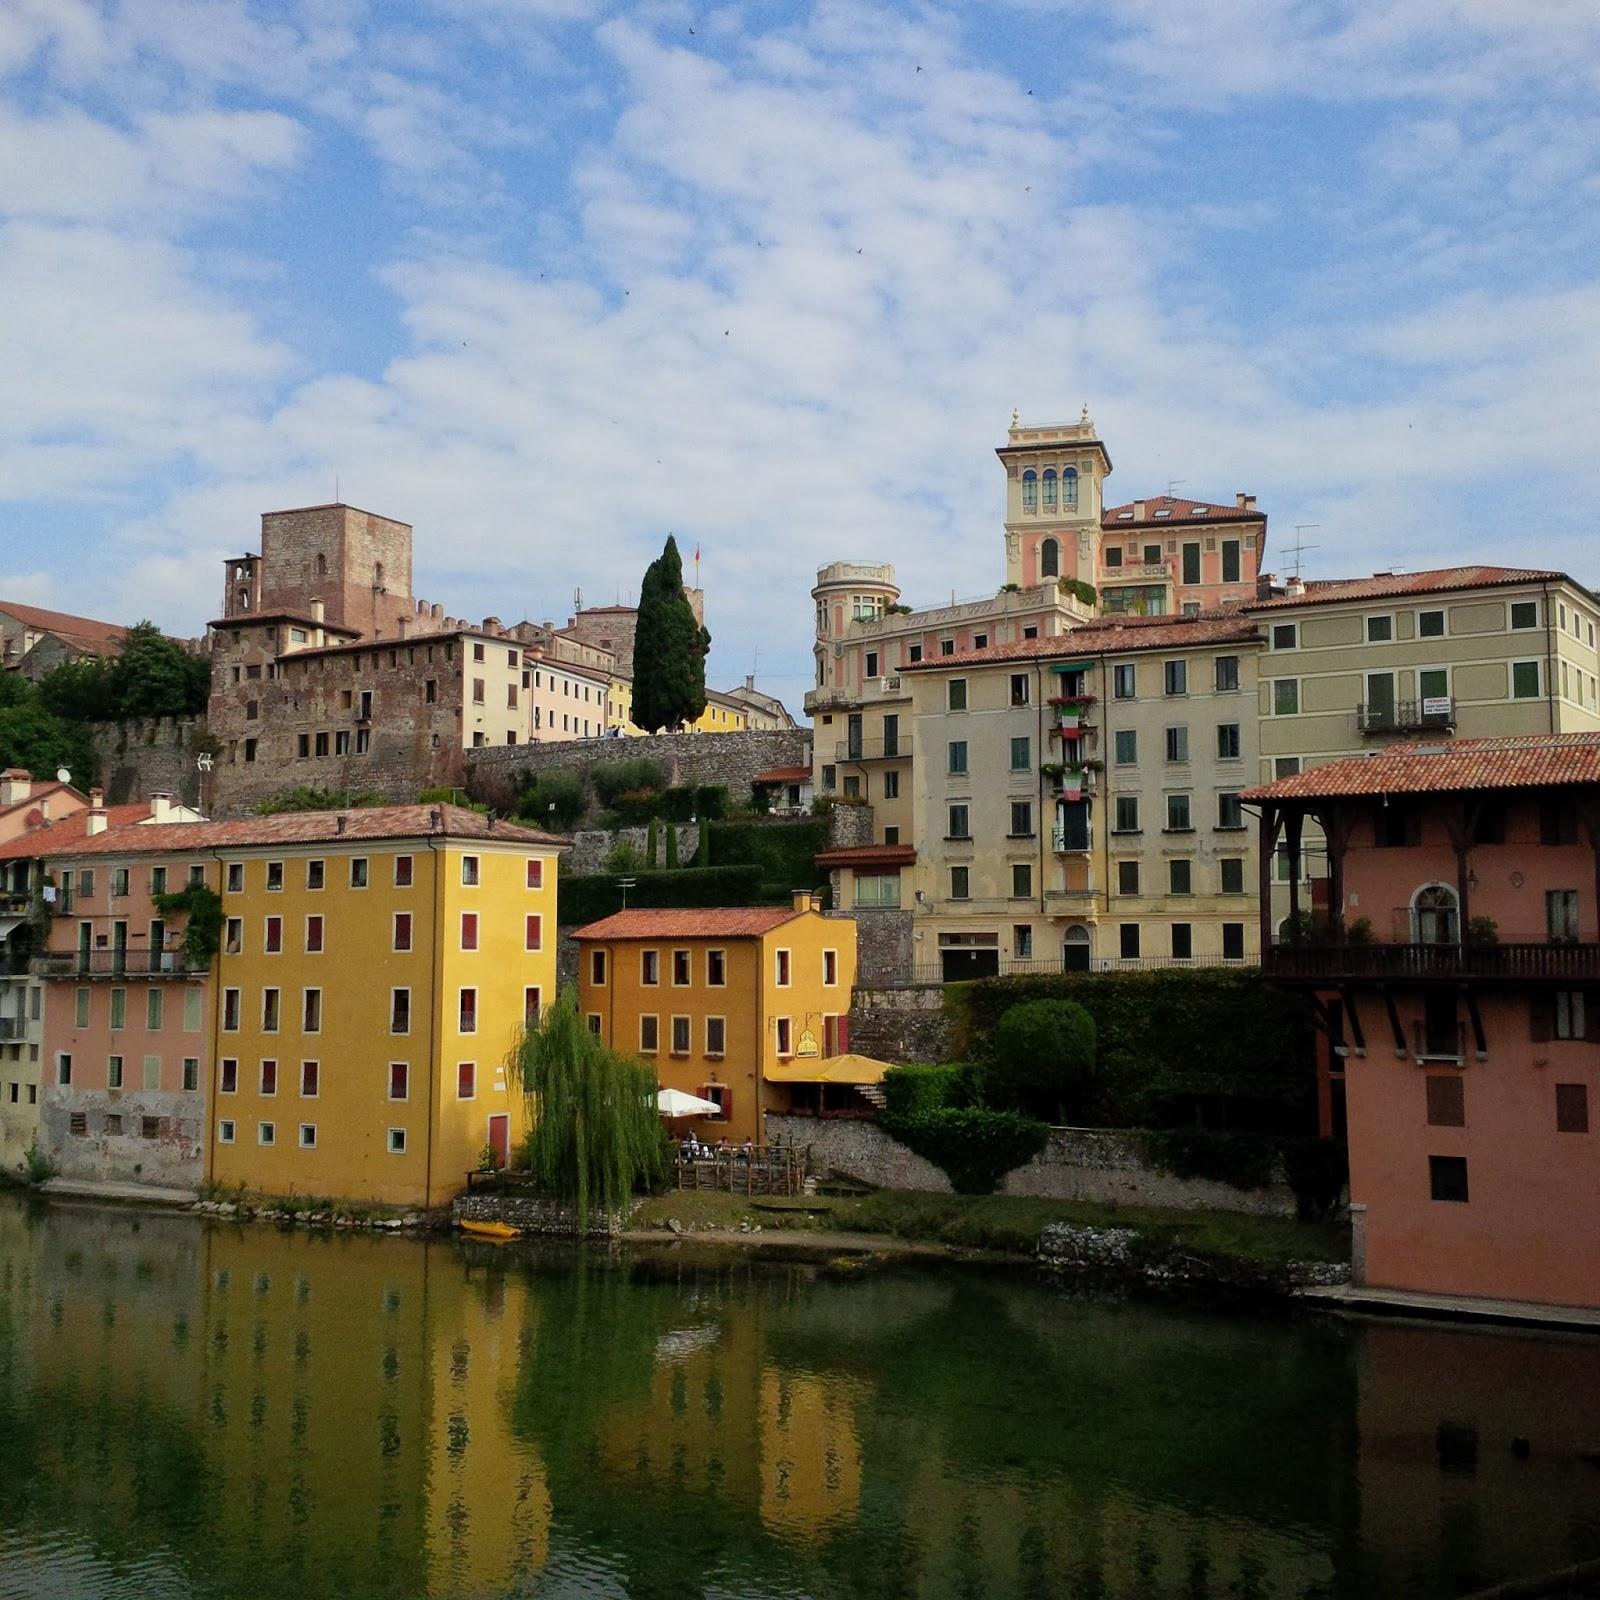 The river Brenta and Bassano del Grapa, Veneto, Italy